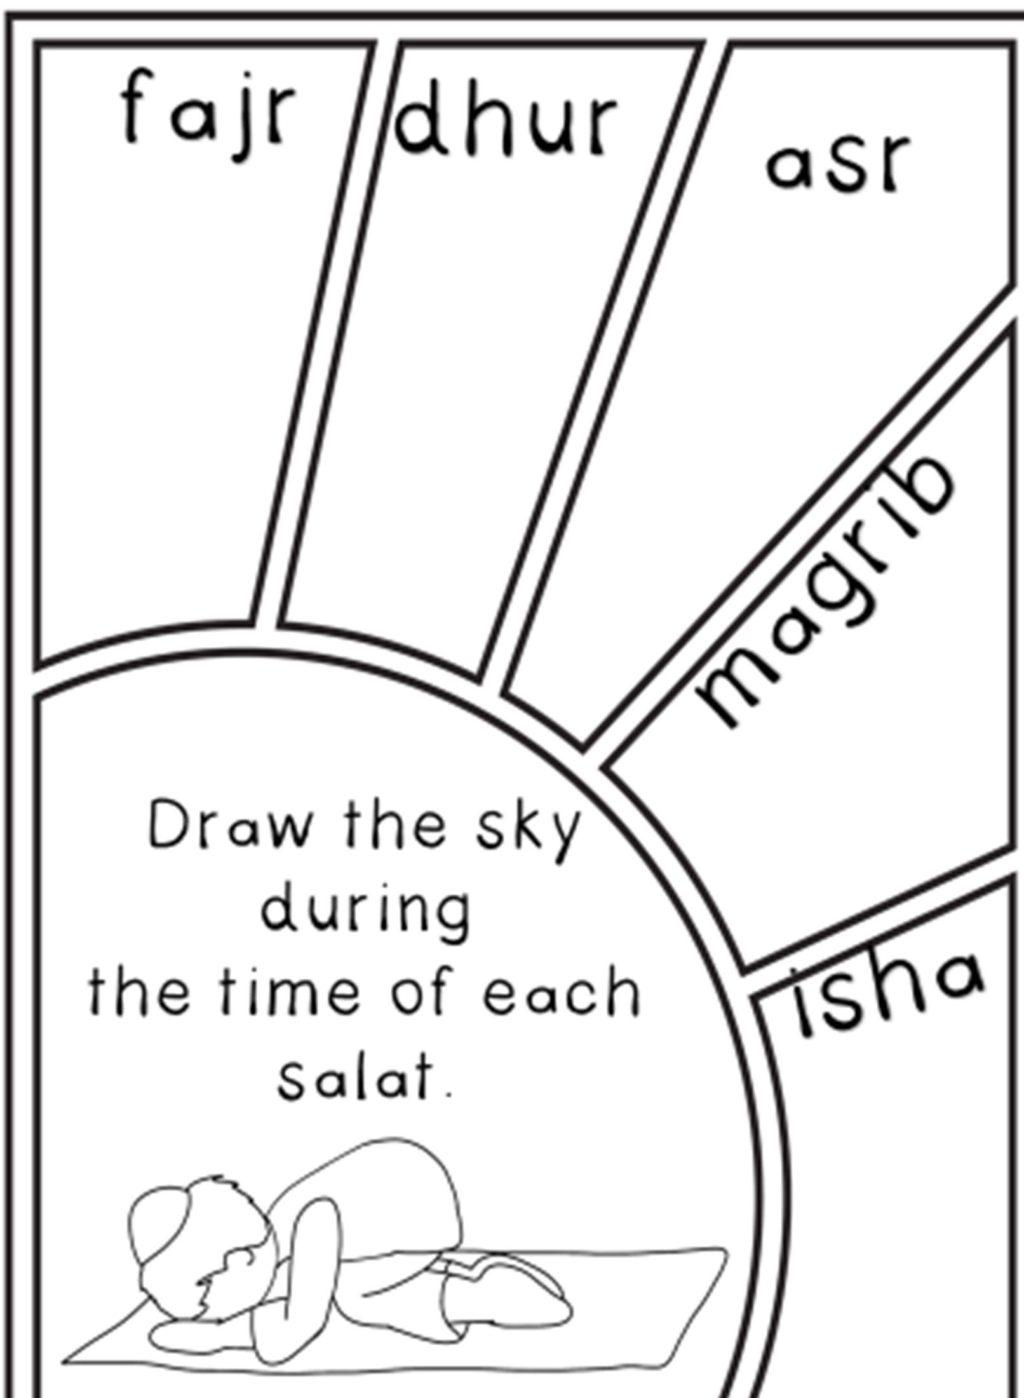 Worksheet Design Interesting Worksheets For Kids Singapore Math   Ramadan Worksheets Printables